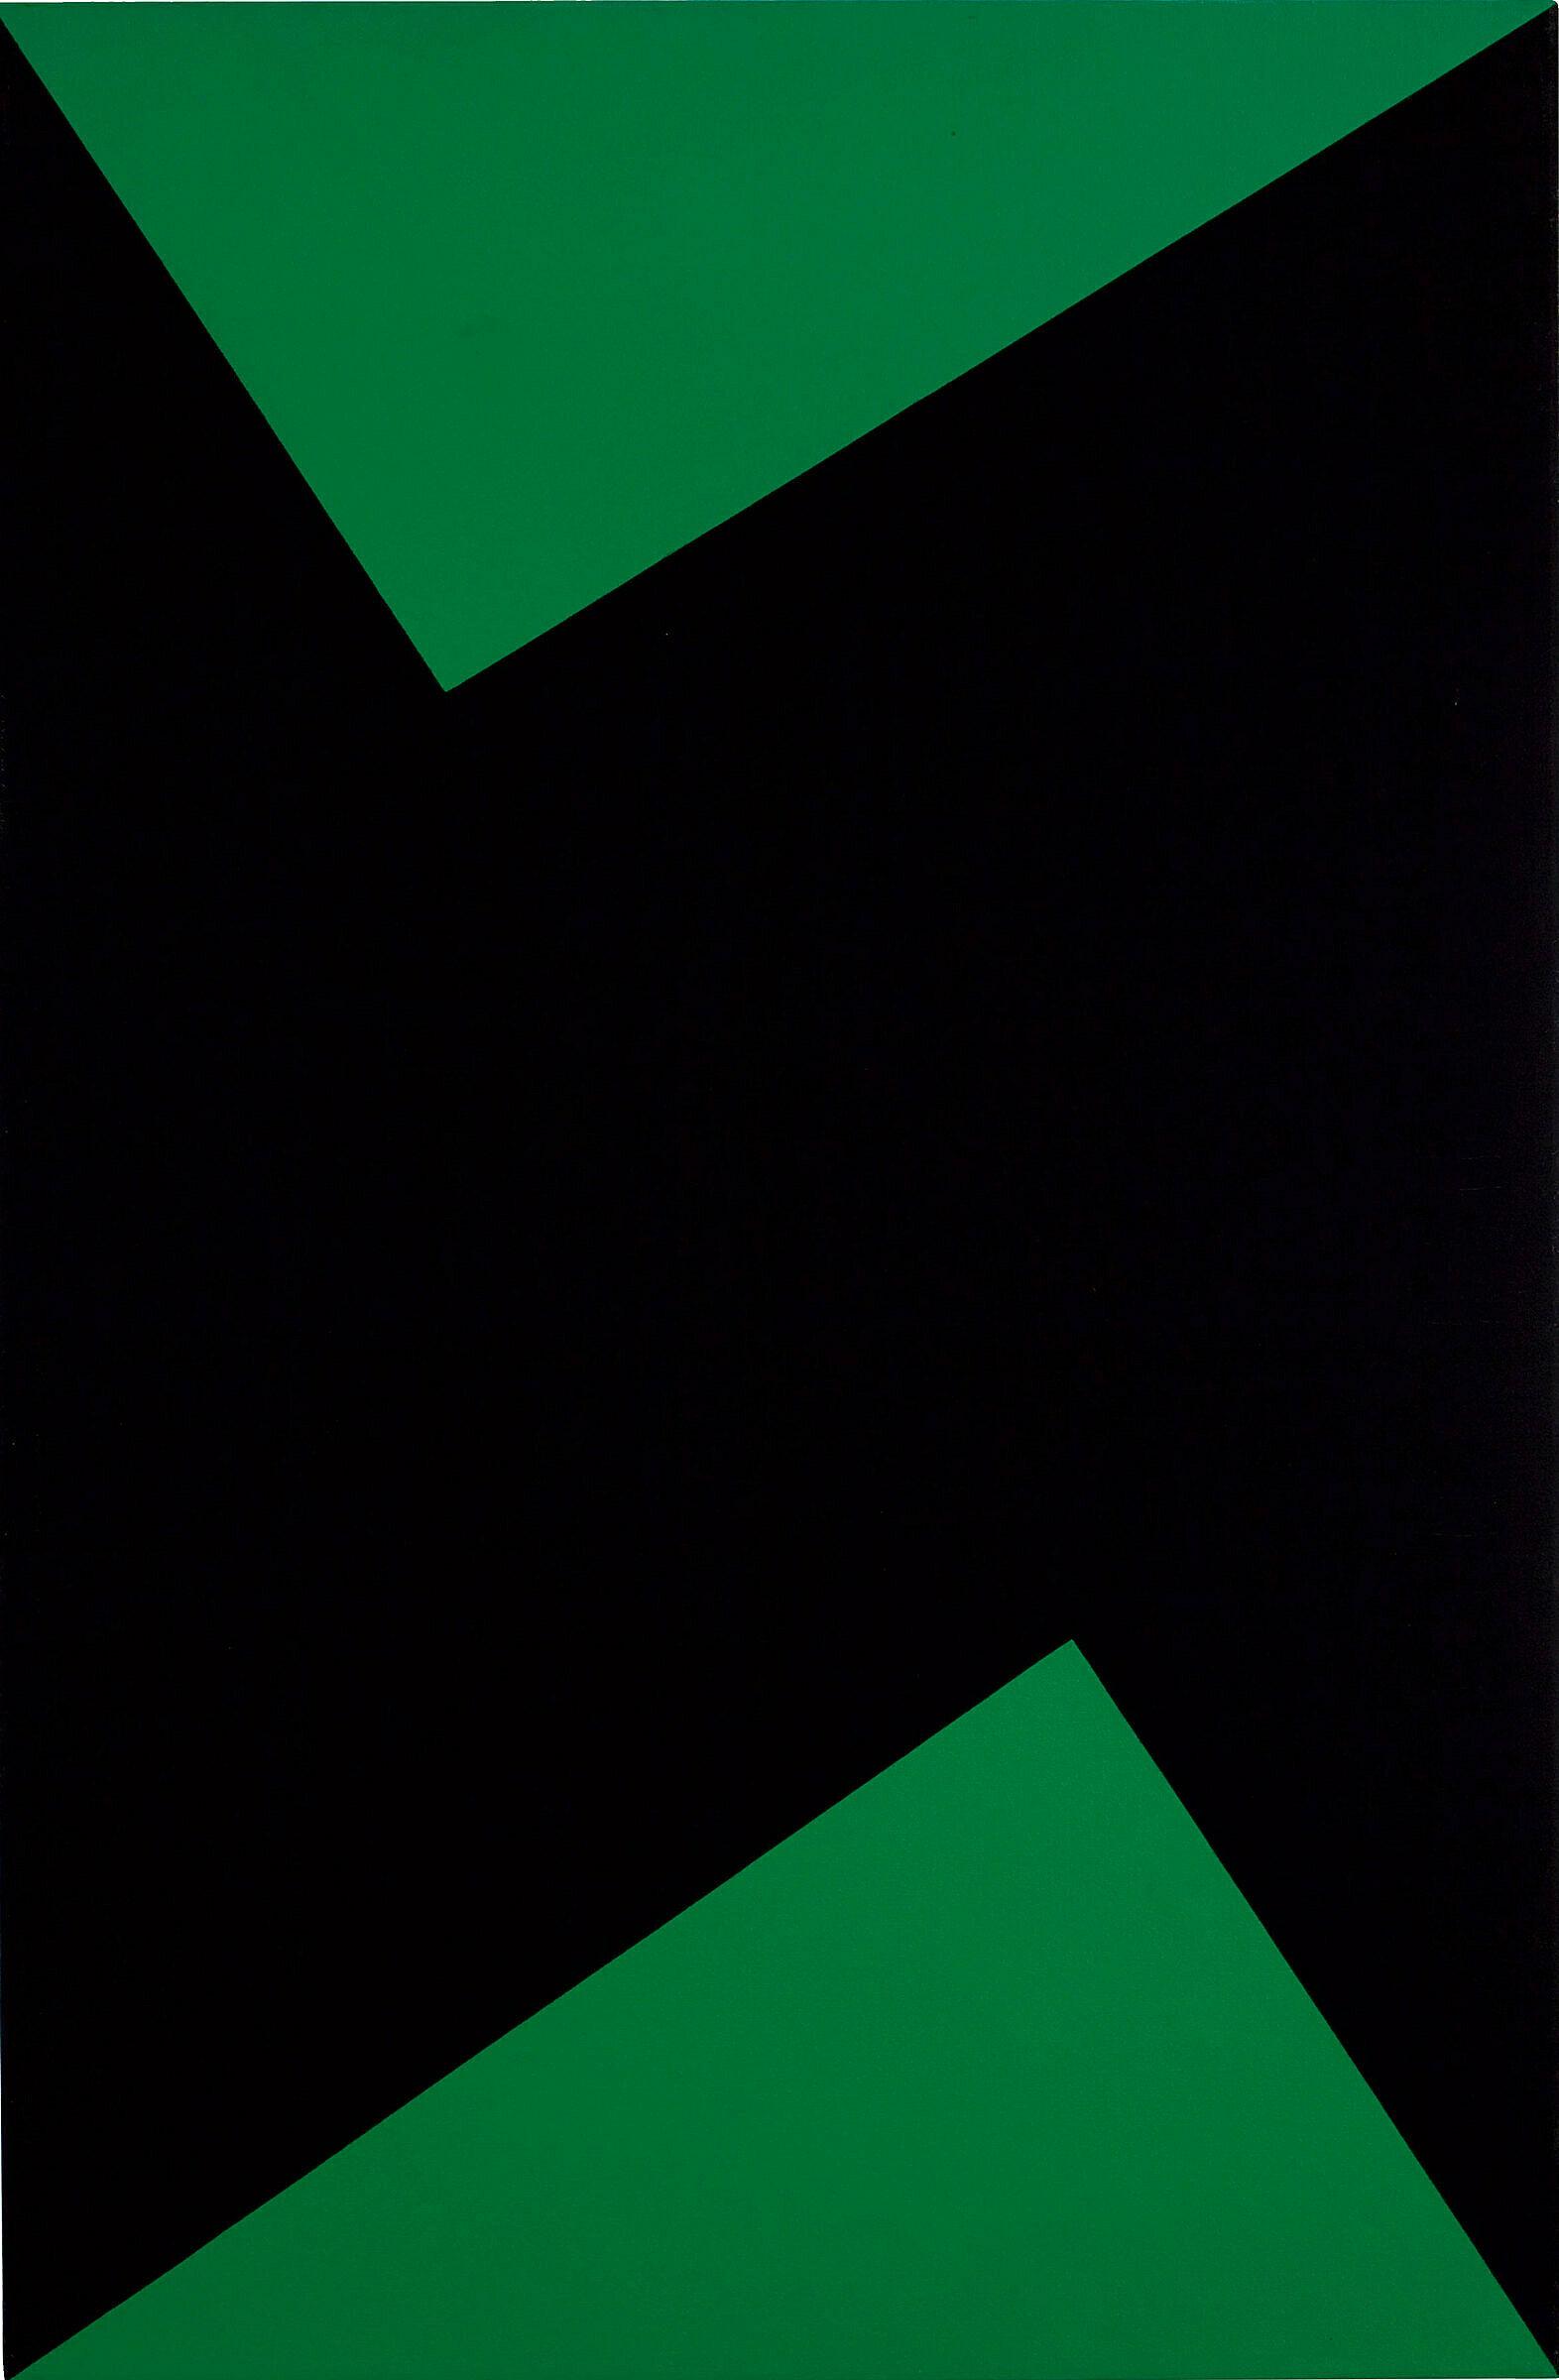 A black and green artwork by Carmen Herrera.